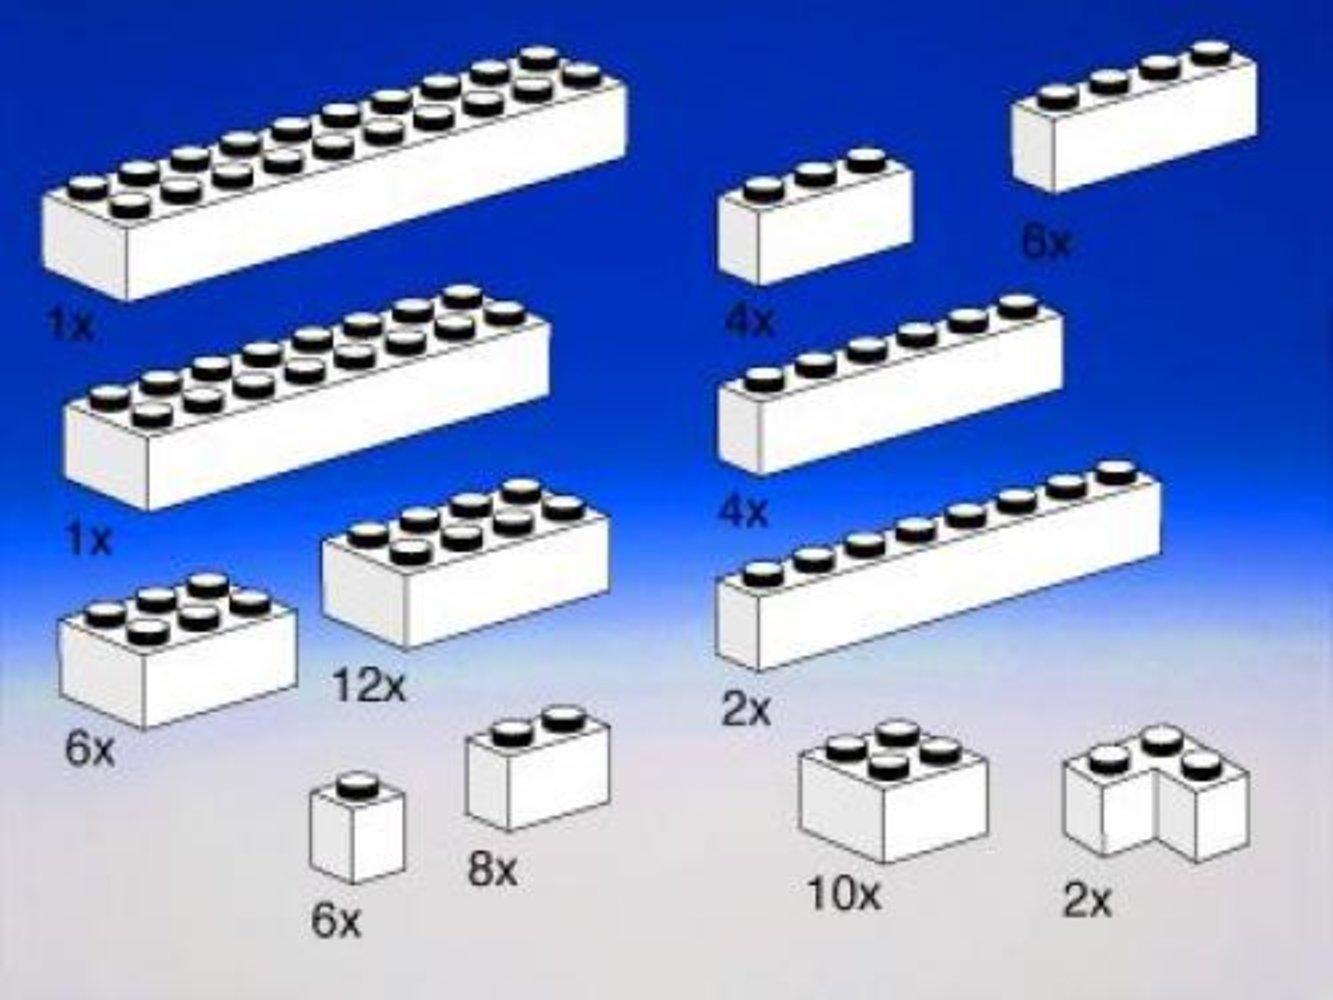 Extra Bricks in White